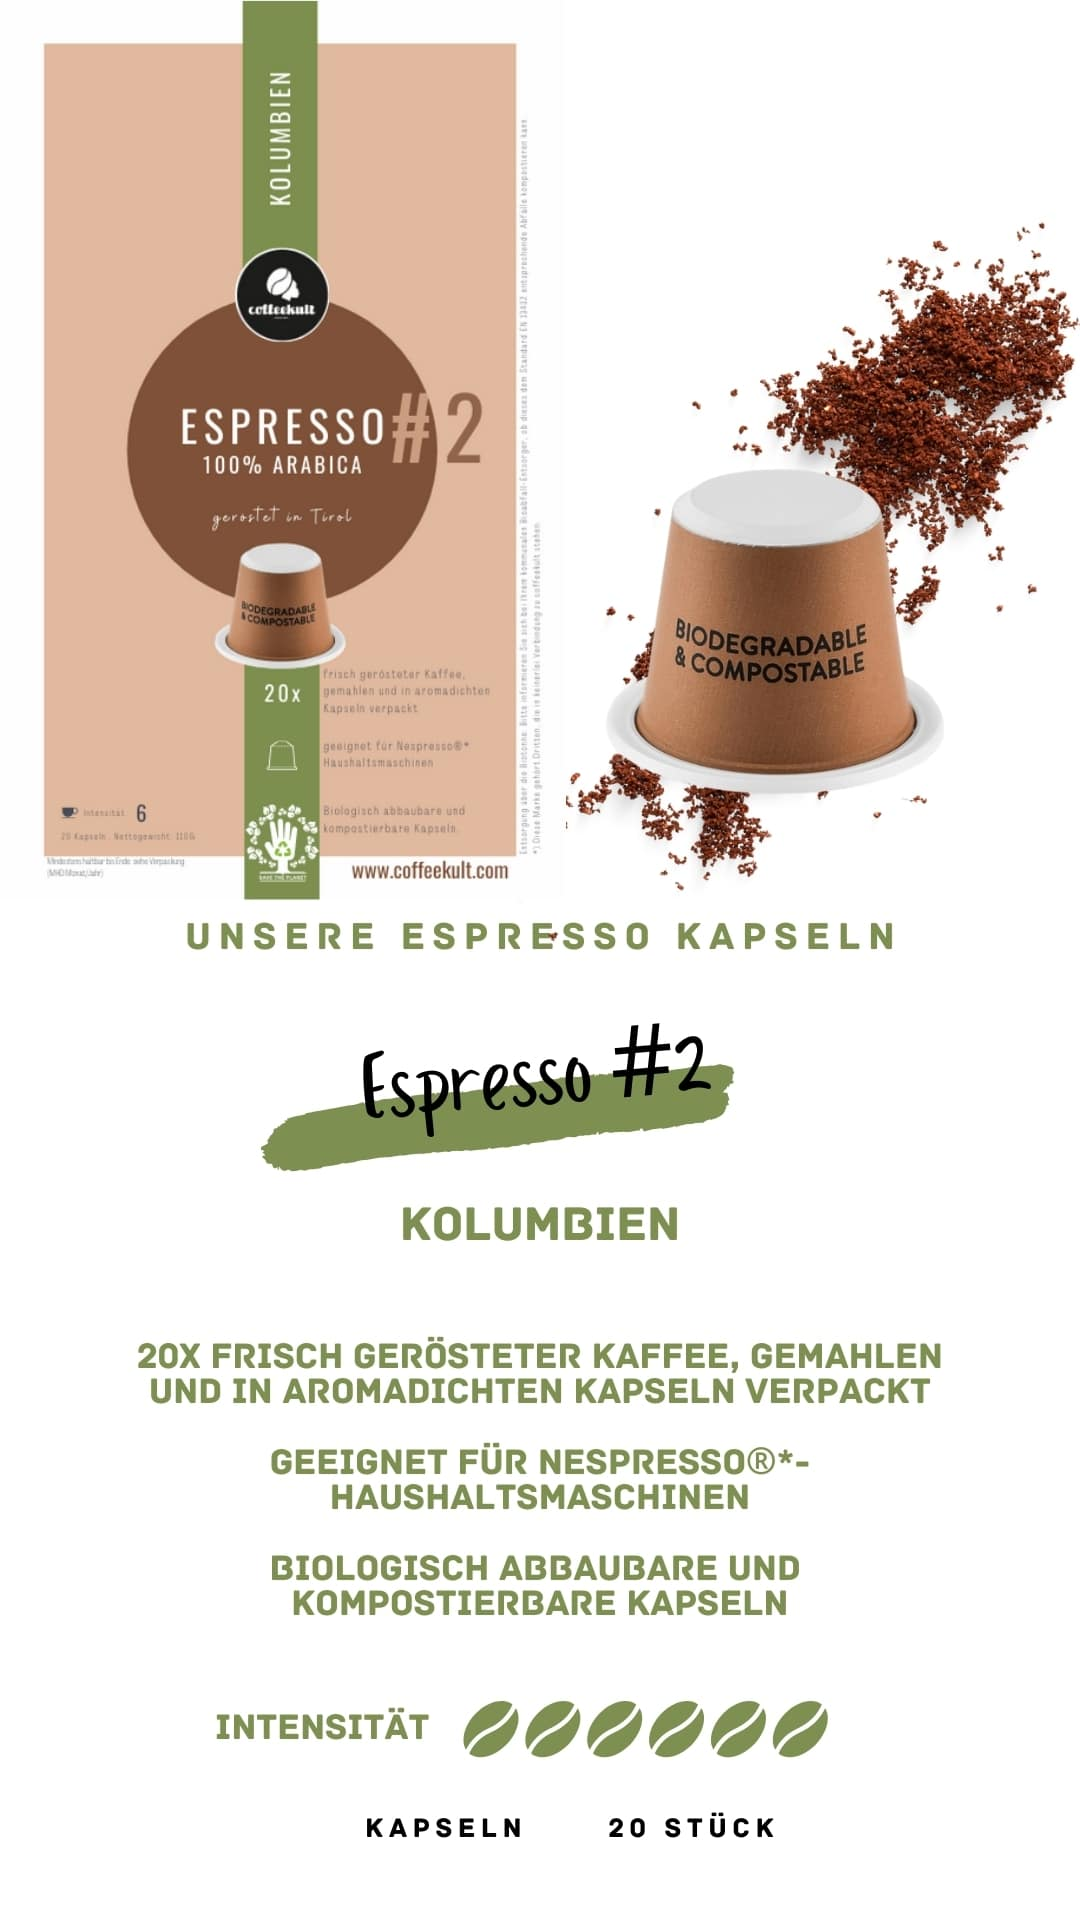 coffeekult coffee frisch geröstet barista kaffeerösterei innsbruck arabica bohnen kolumbien espresso kapseln